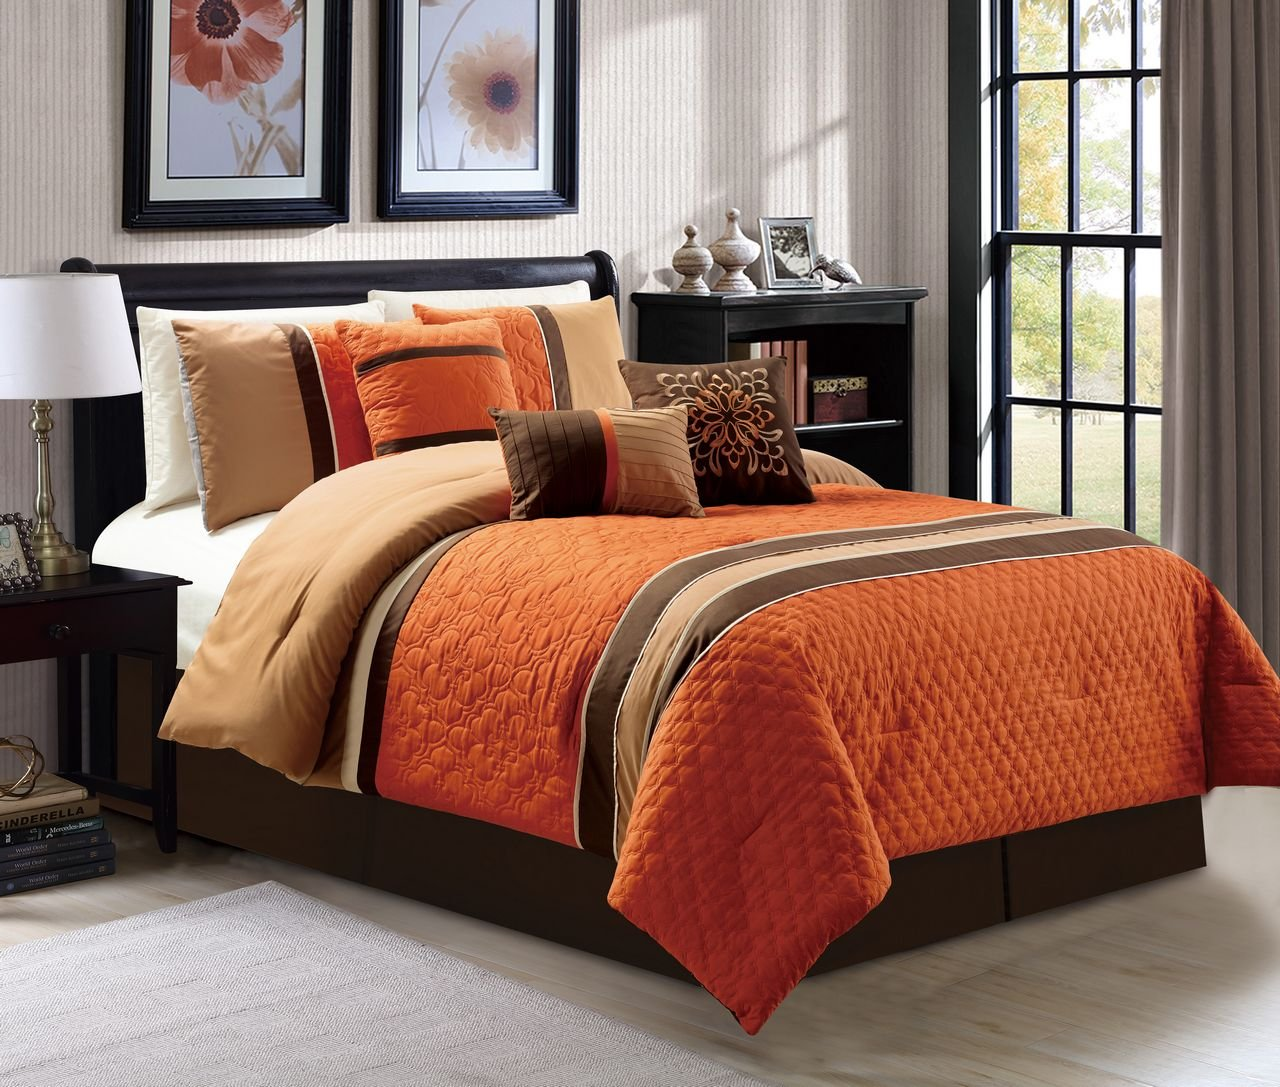 7 pc cal king size quartrefoil quilted orange taupe - King size bedroom comforter sets ...